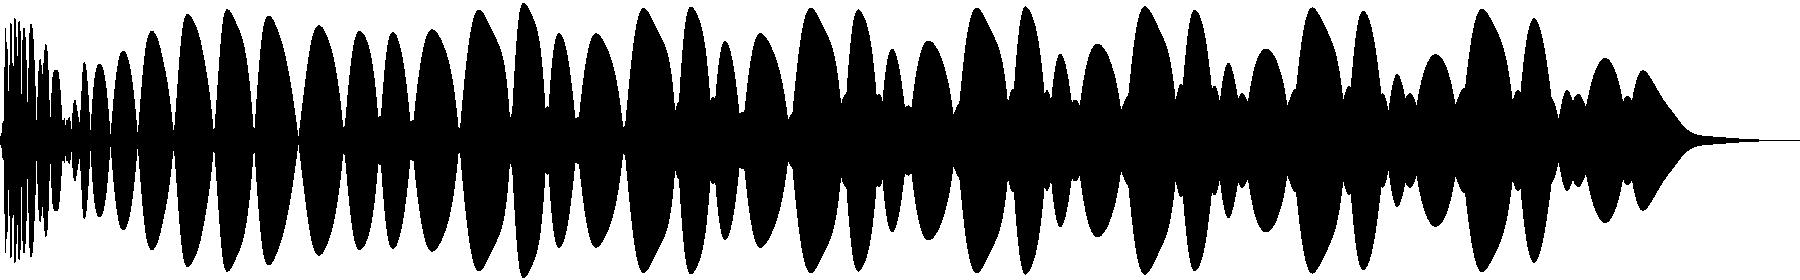 vedh bass cut 026 g